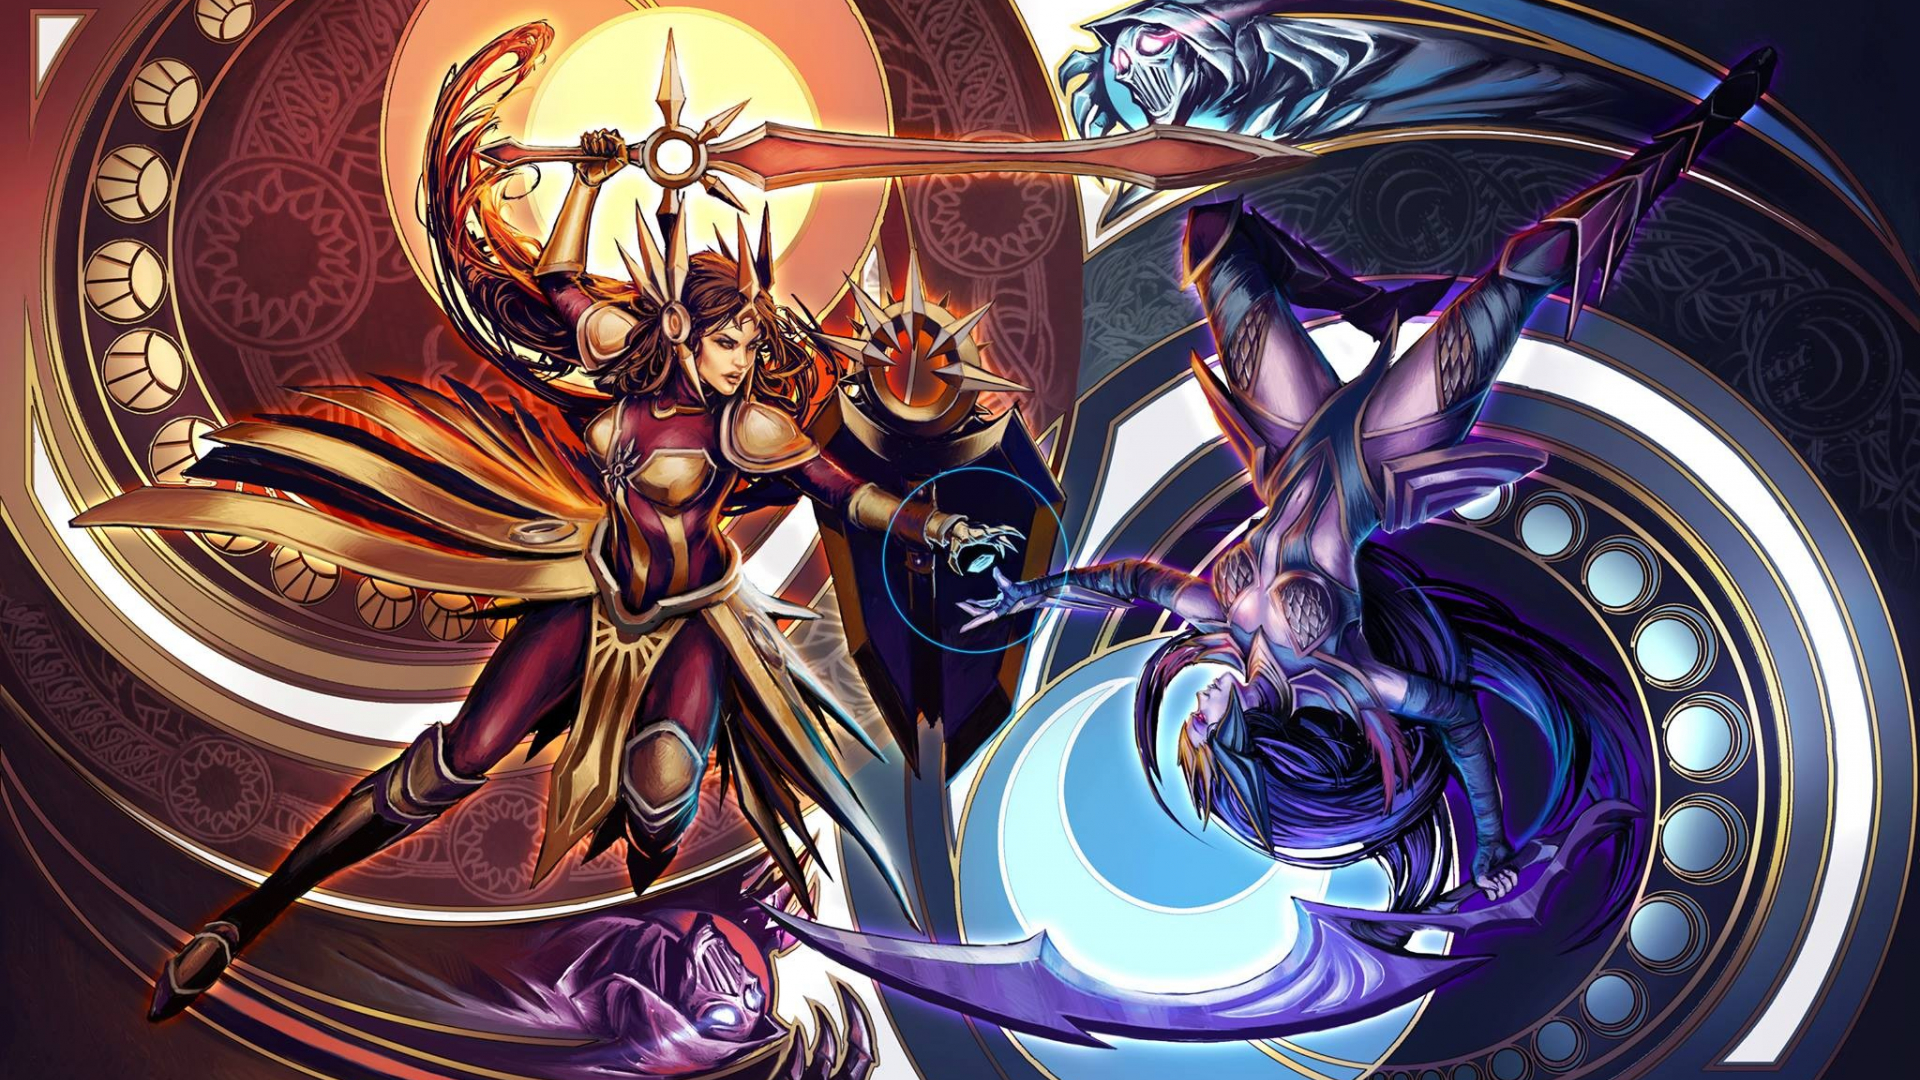 Free Download Women Fight League Of Legends Swords Leona Diana